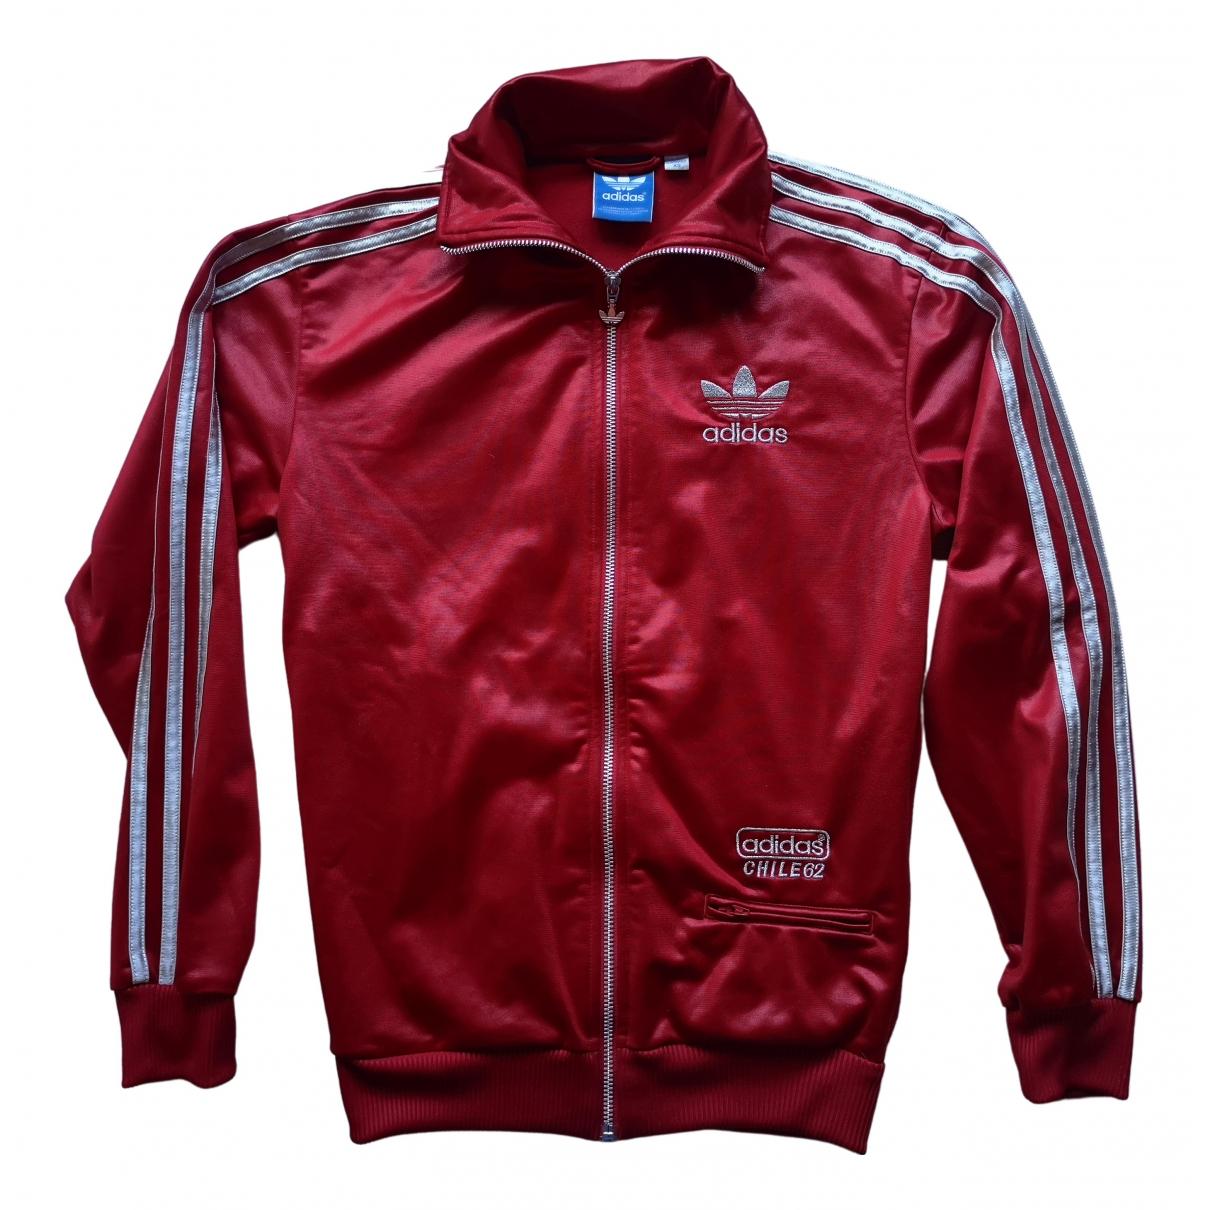 Adidas \N Red jacket  for Men XS International